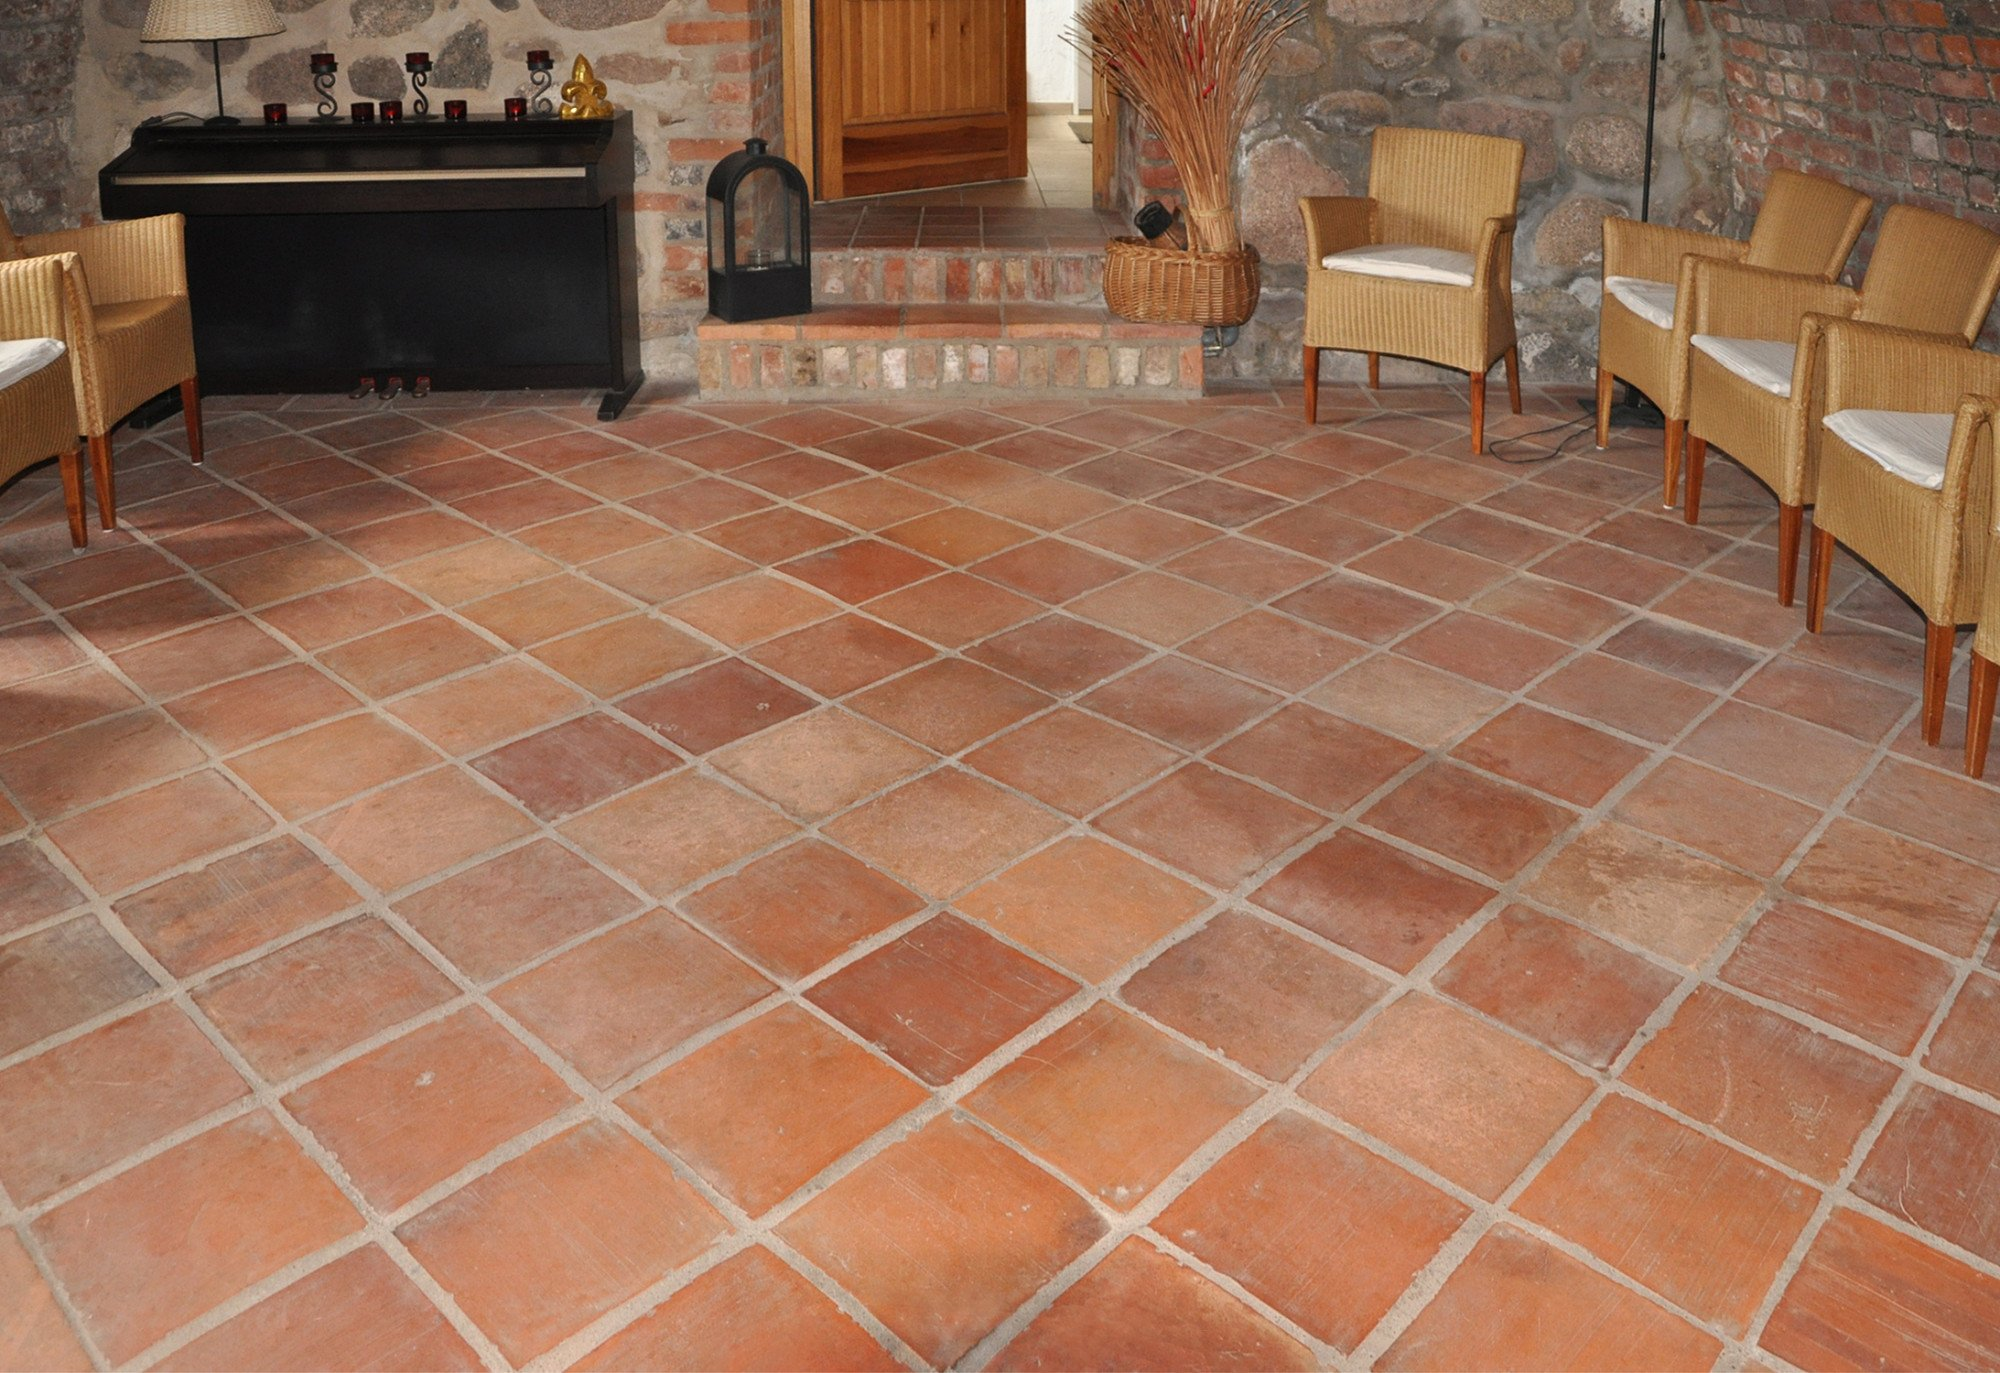 Full Size of Italienische Bodenfliesen Terracottafliesen Oder Cottoplatten Fliesen Und Platten Bad Küche Wohnzimmer Italienische Bodenfliesen